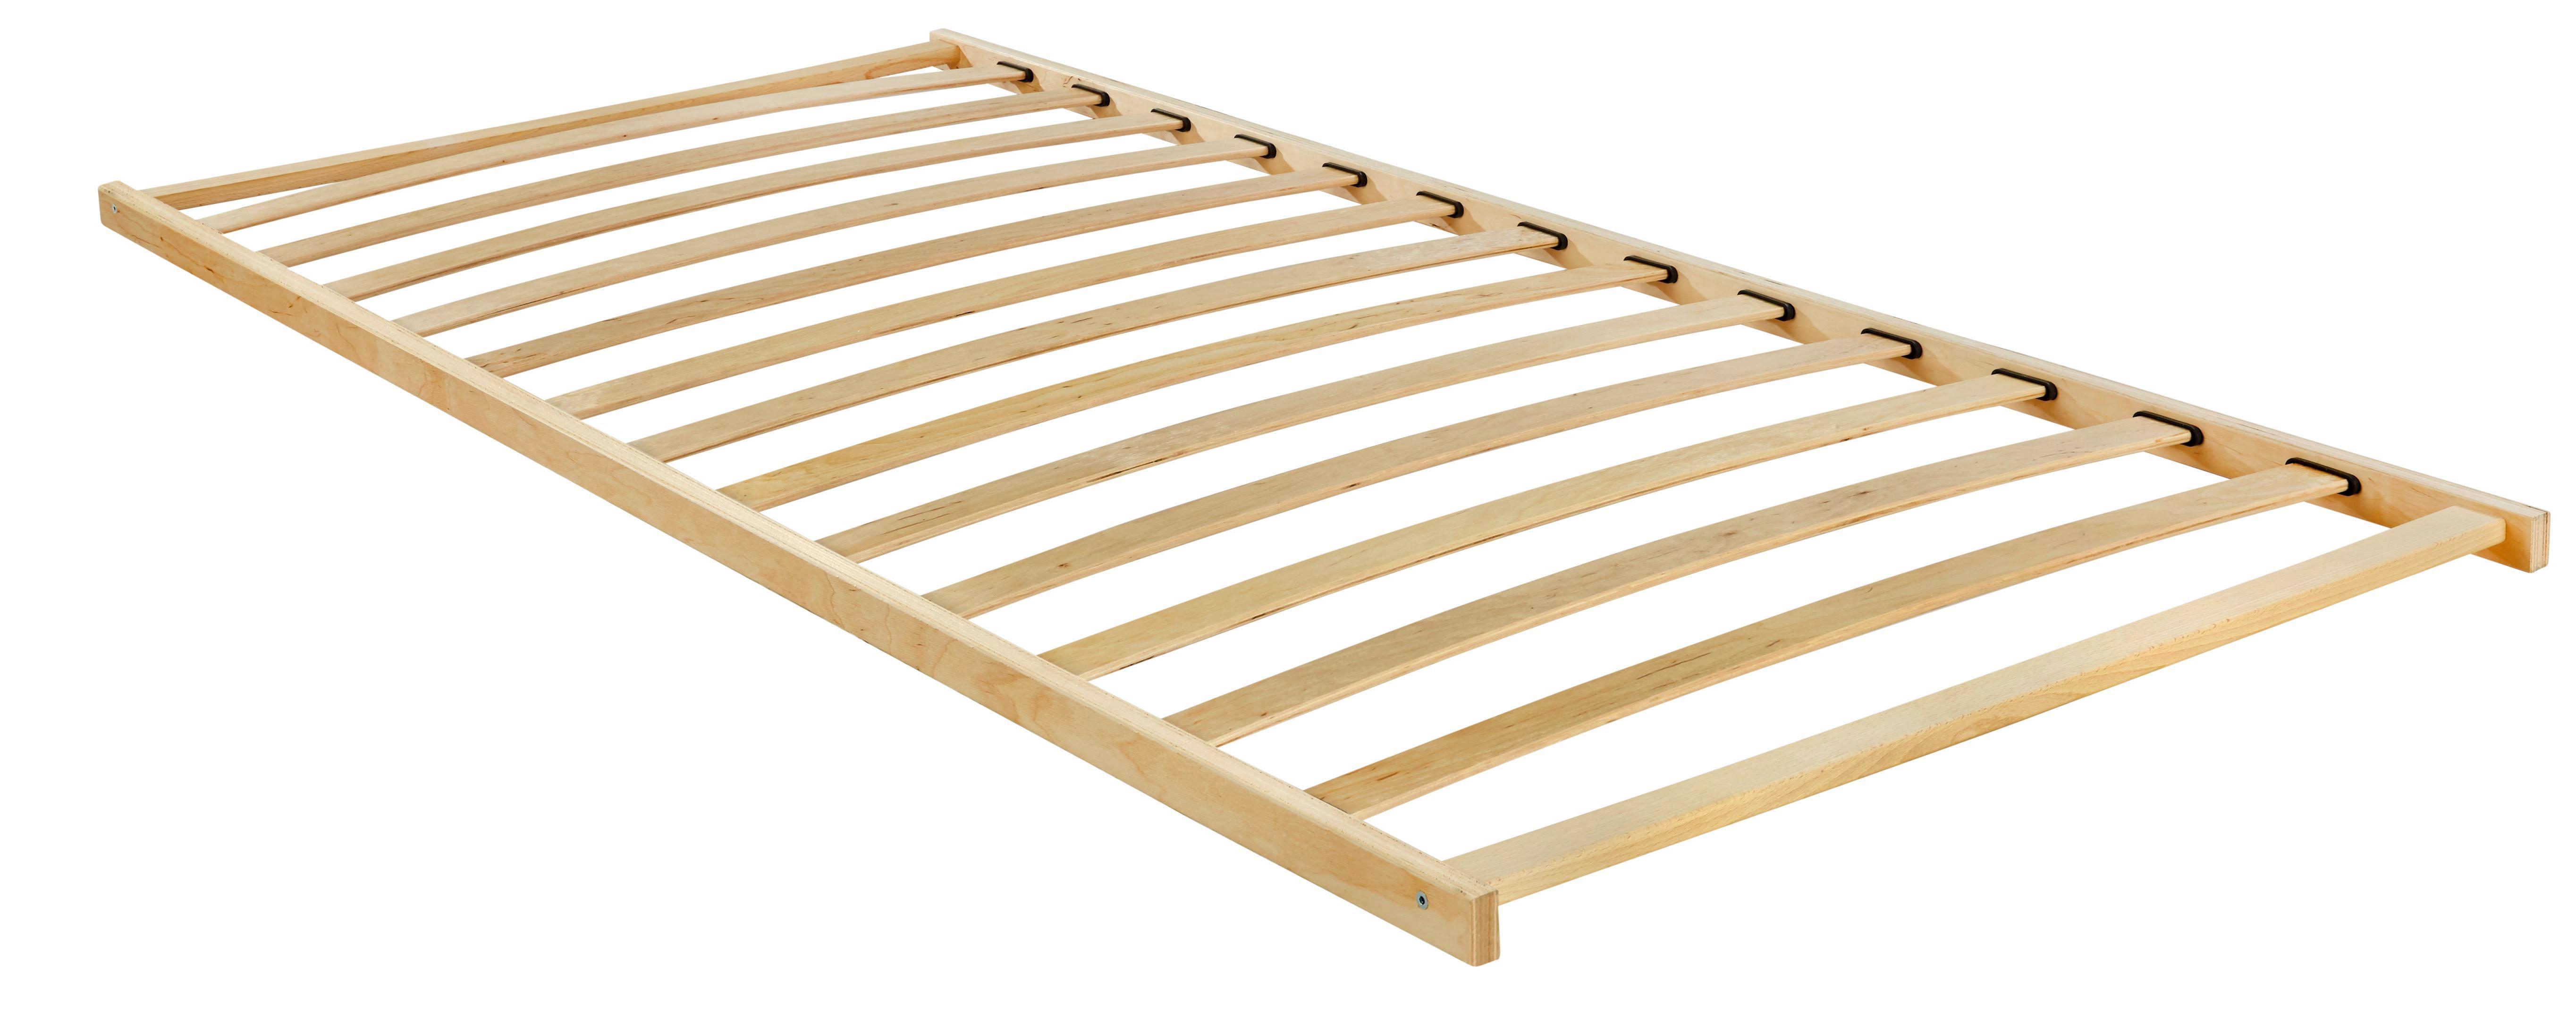 Lattenrost aus Holz, ca. 100x200cm - (100/200cm) - NADANA